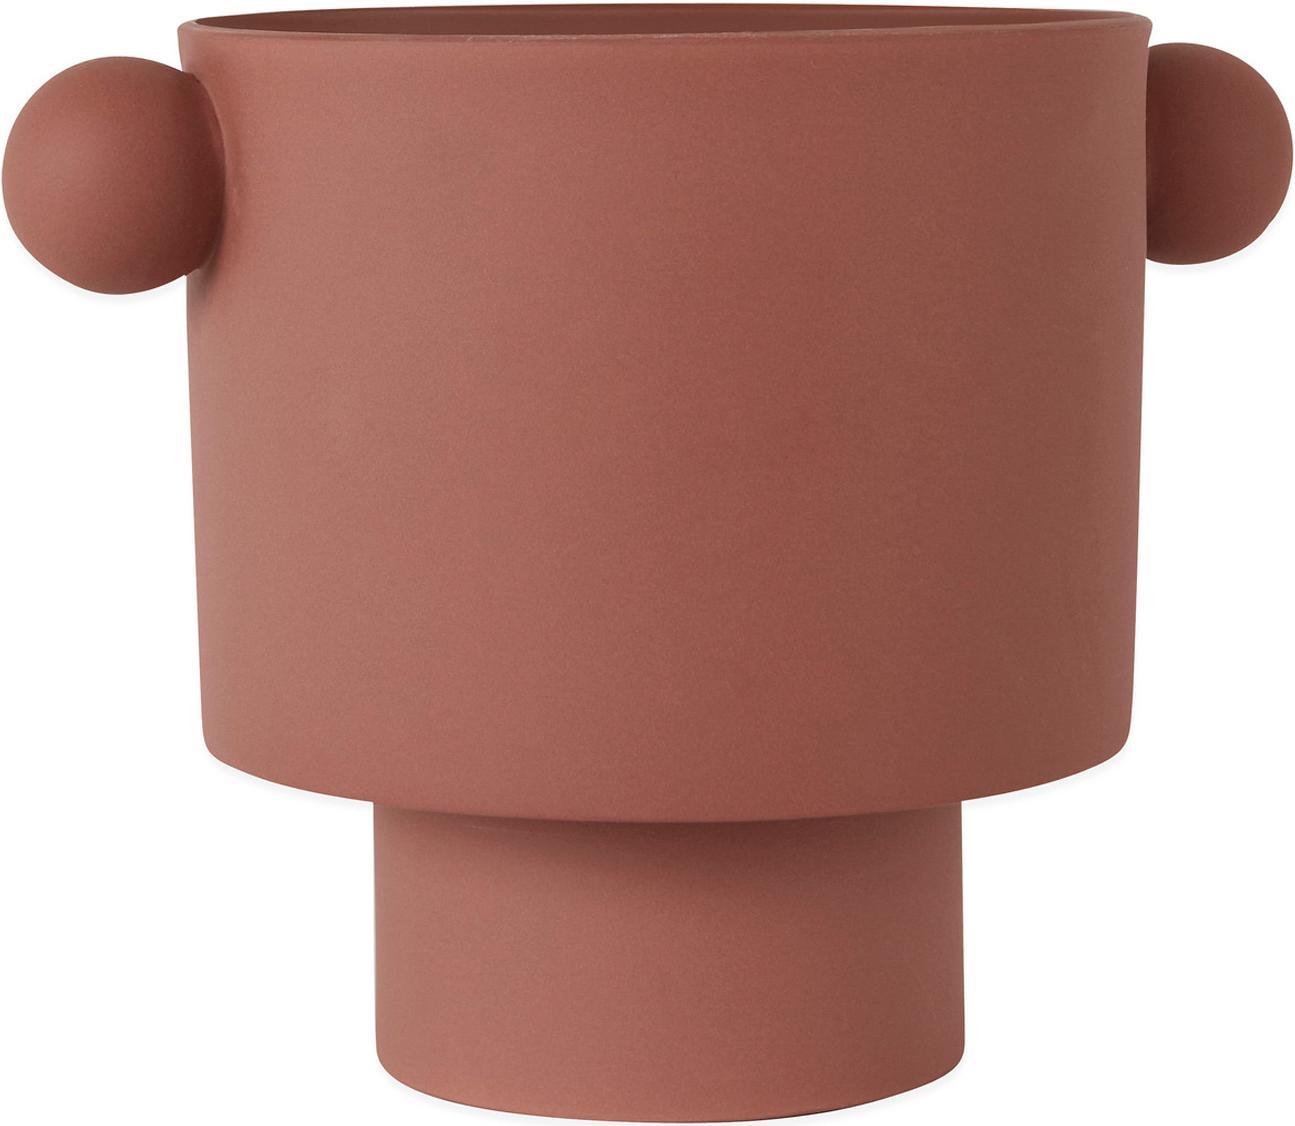 Großer handgefertigter Übertopf Ika aus Keramik, Keramik, Terrakotta, Ø 30 x H 23 cm